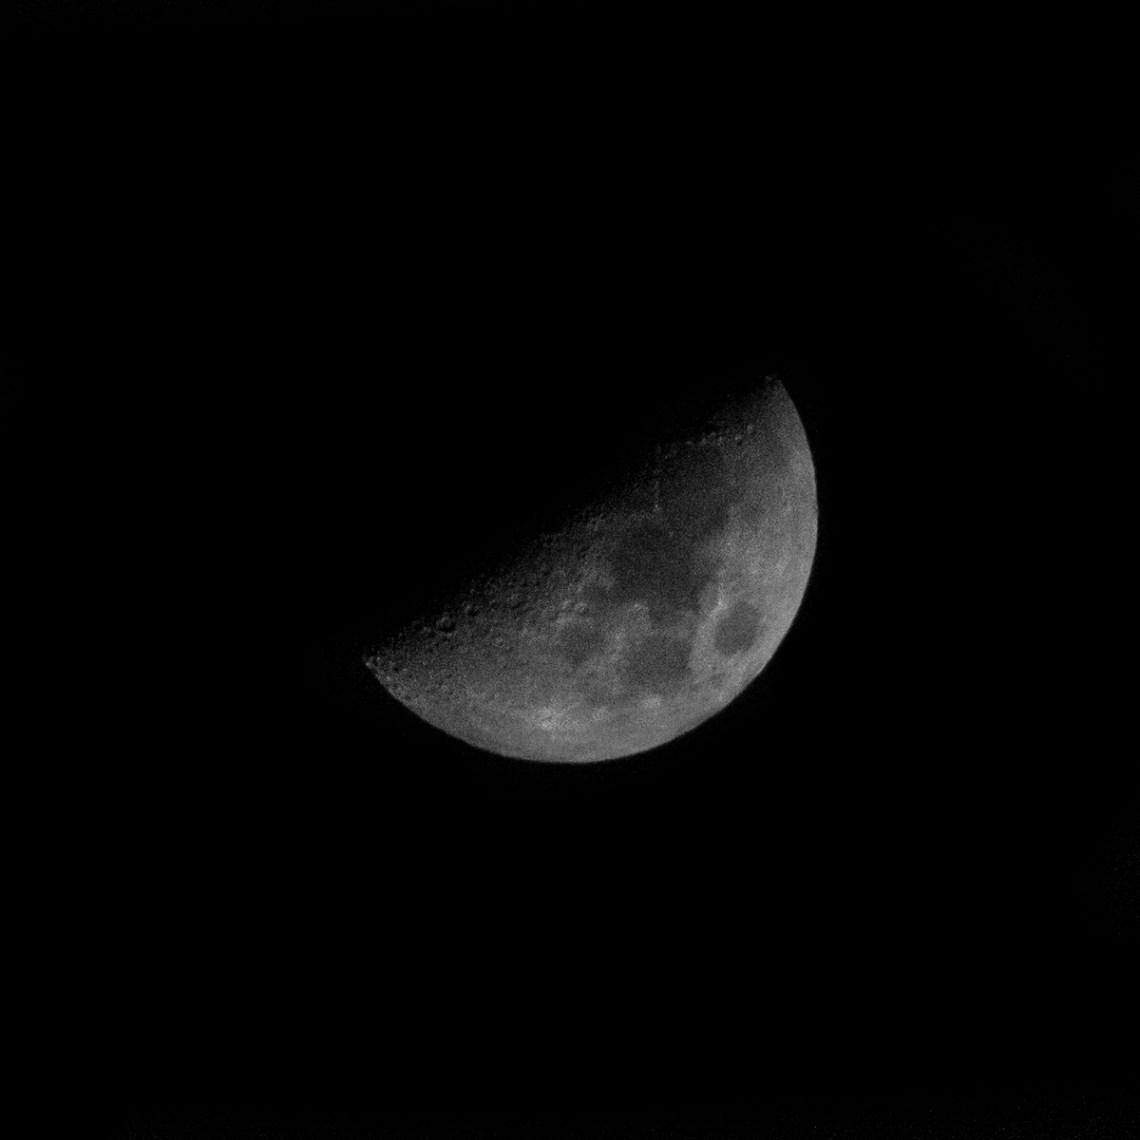 365 - 18 - The Moon